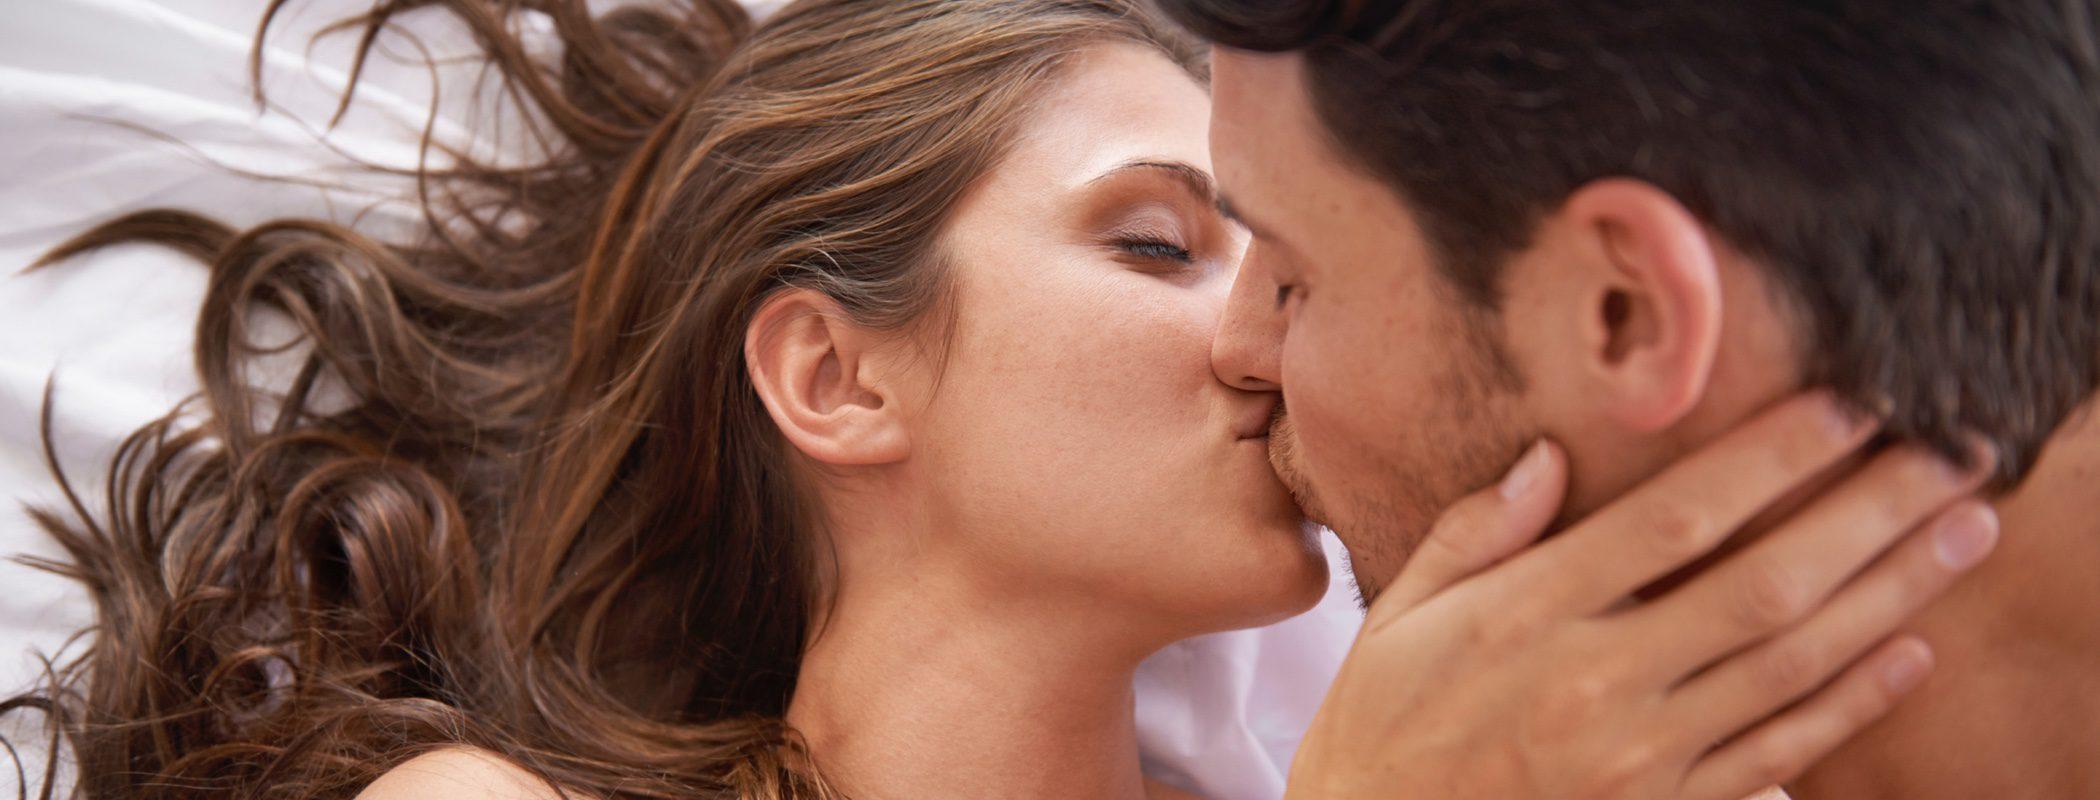 ¿Sexo con o sin amor? Distintas opciones con intereses diferentes